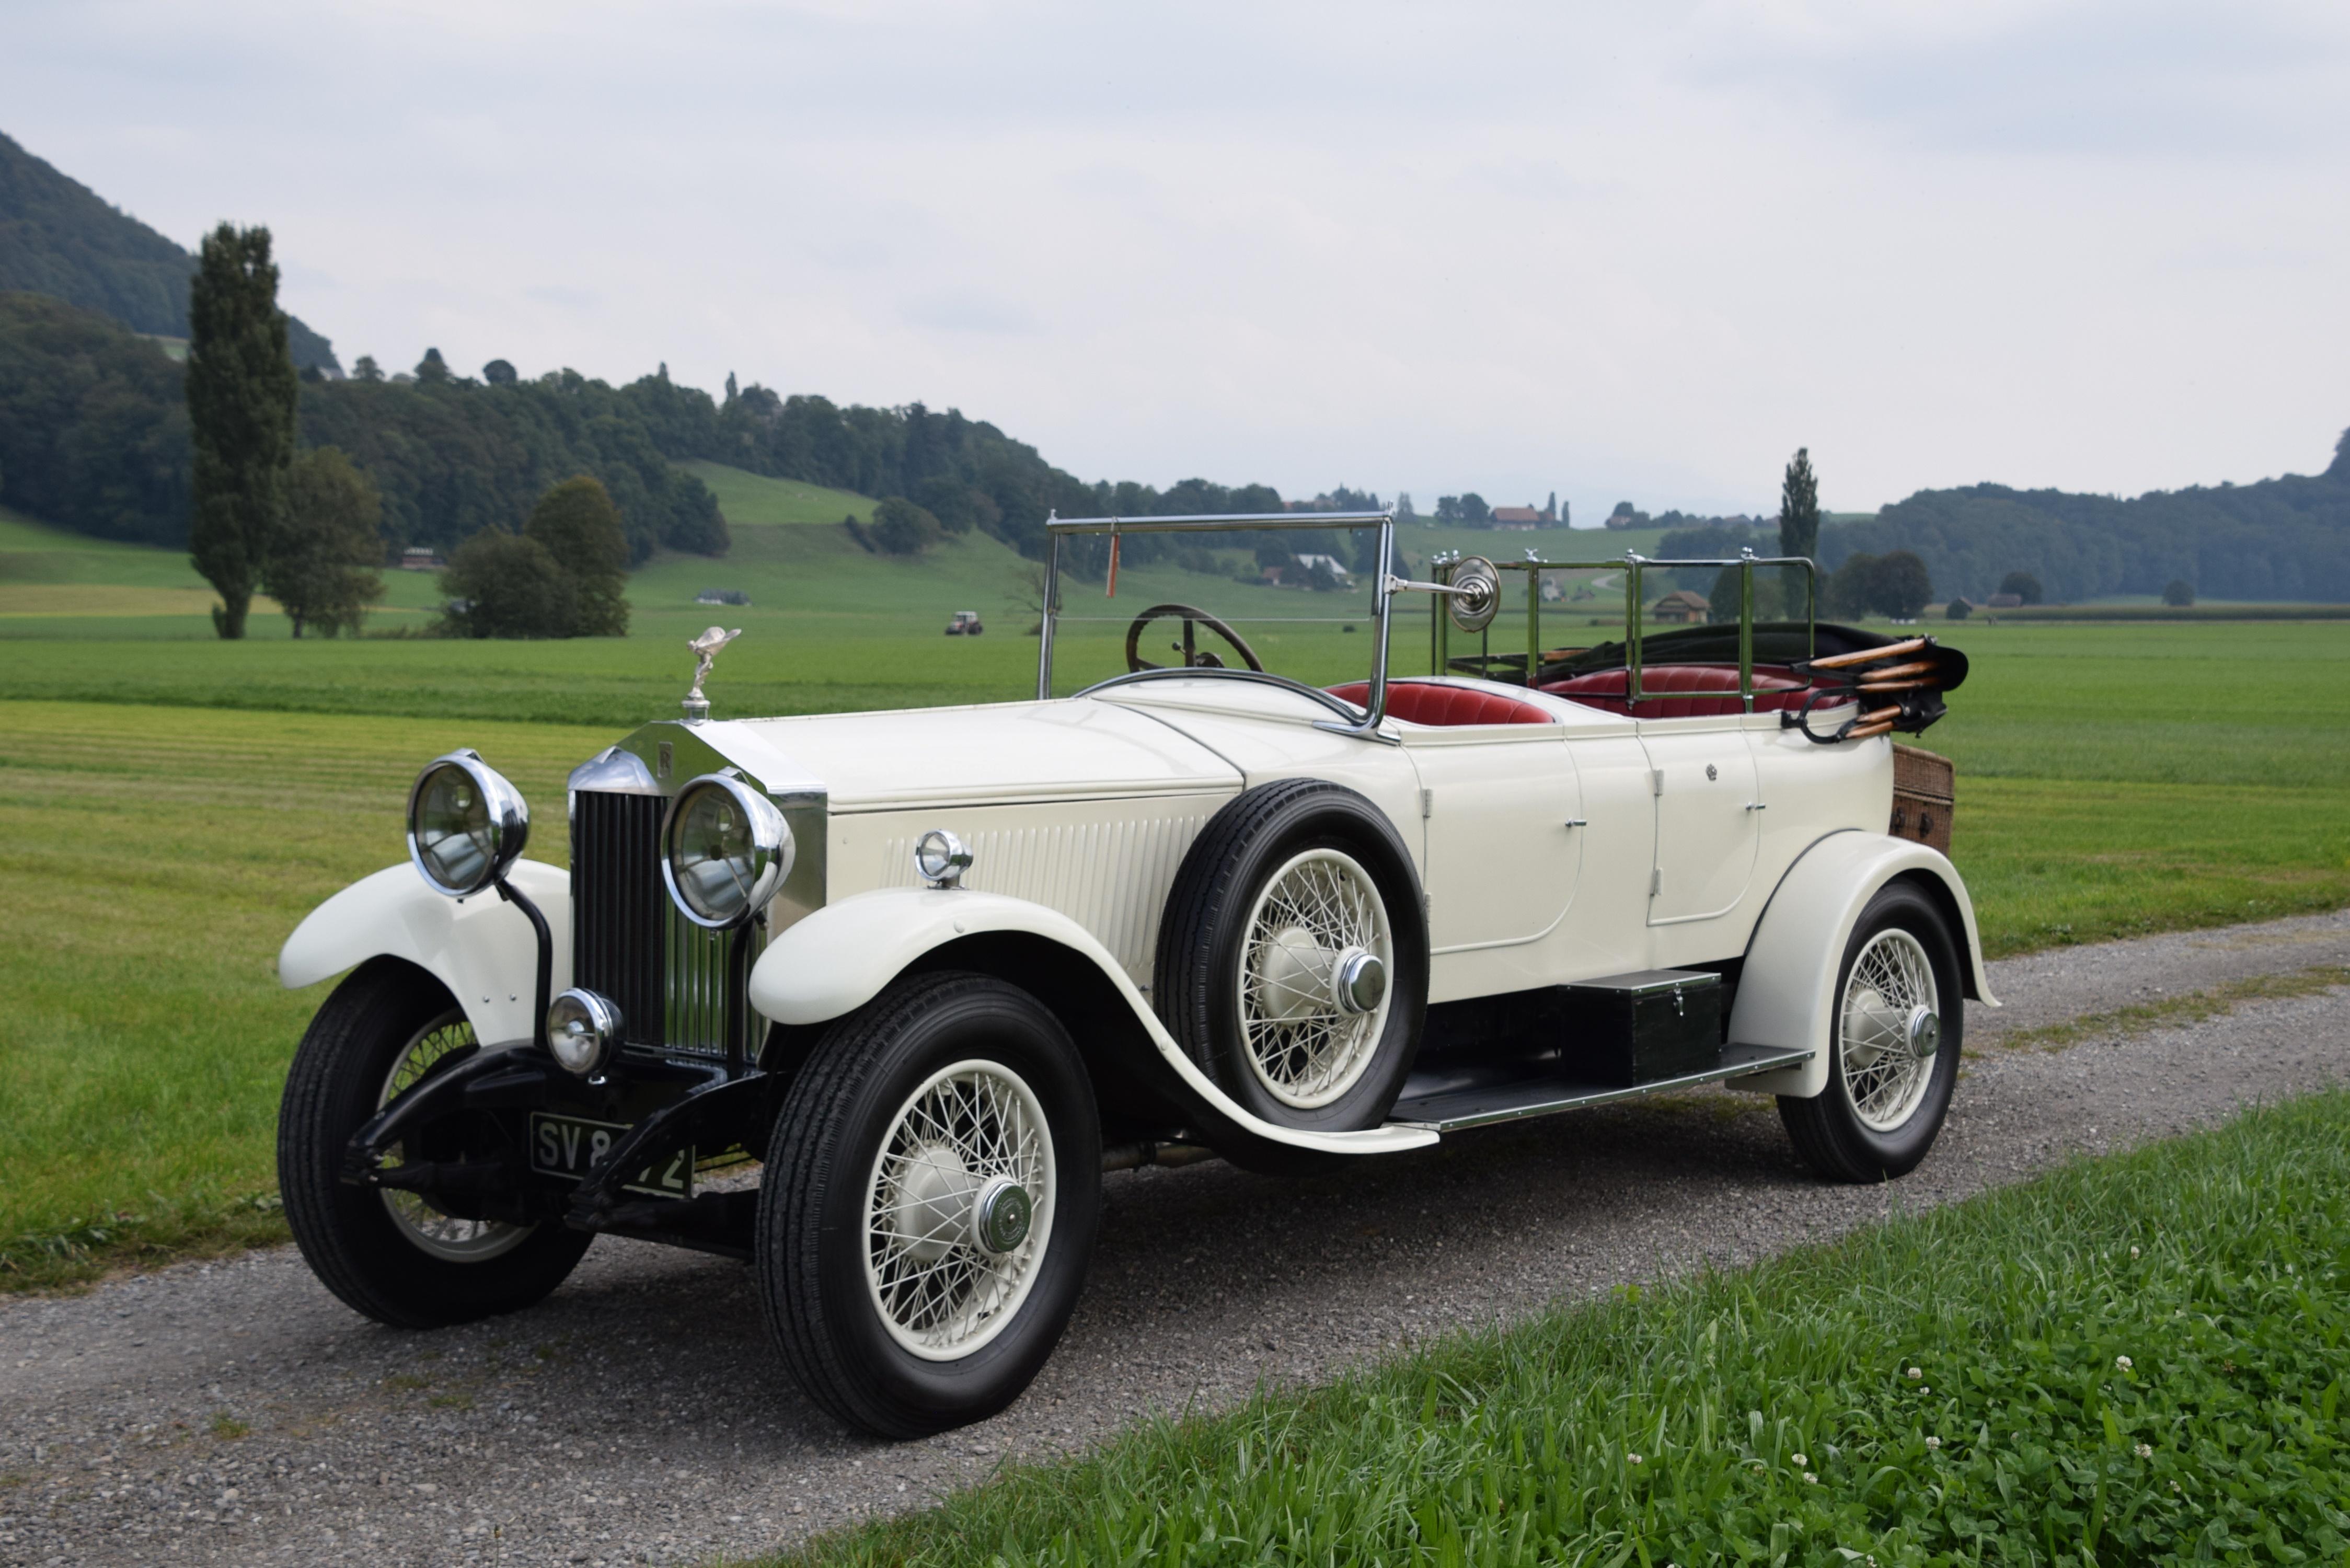 1925 Rolls Royce Phantom >> 1925 Rolls Royce Phantom I Vintage Car For Sale